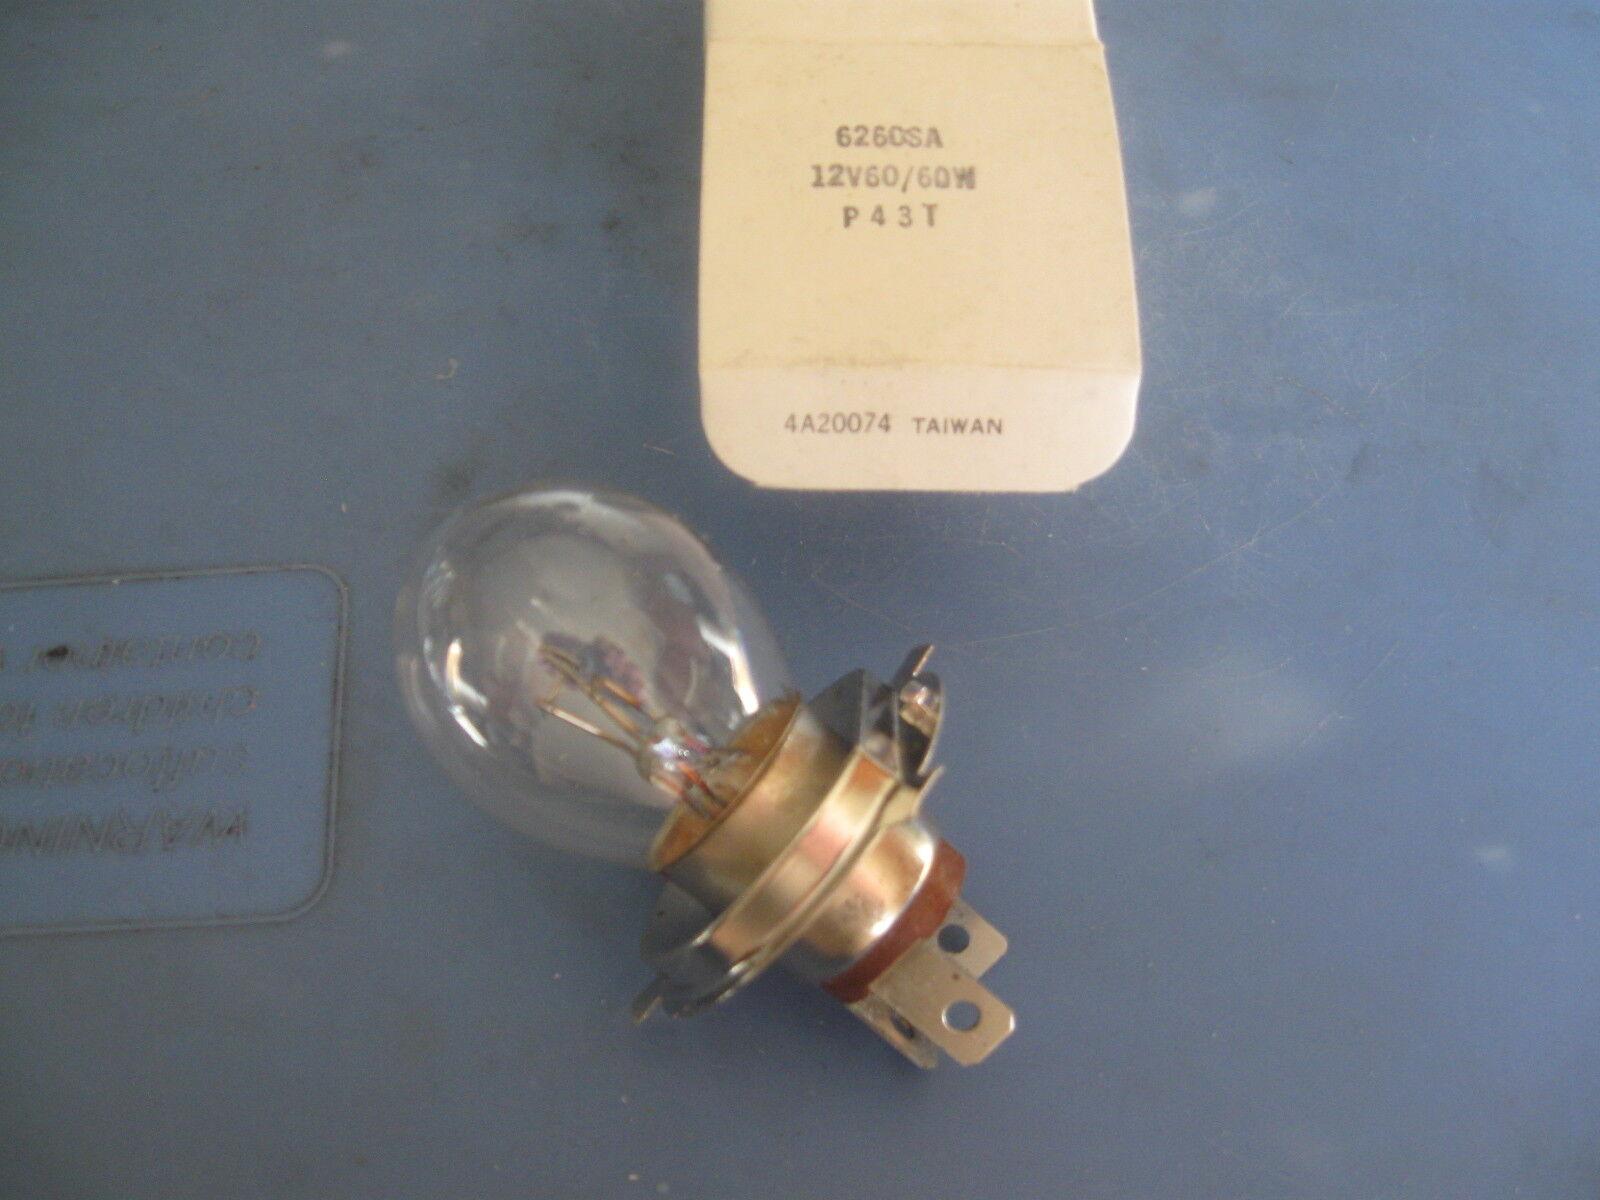 Snowmobile Headlight Bulb. 6260SA. 12V60/60W. P43T Base. NOS